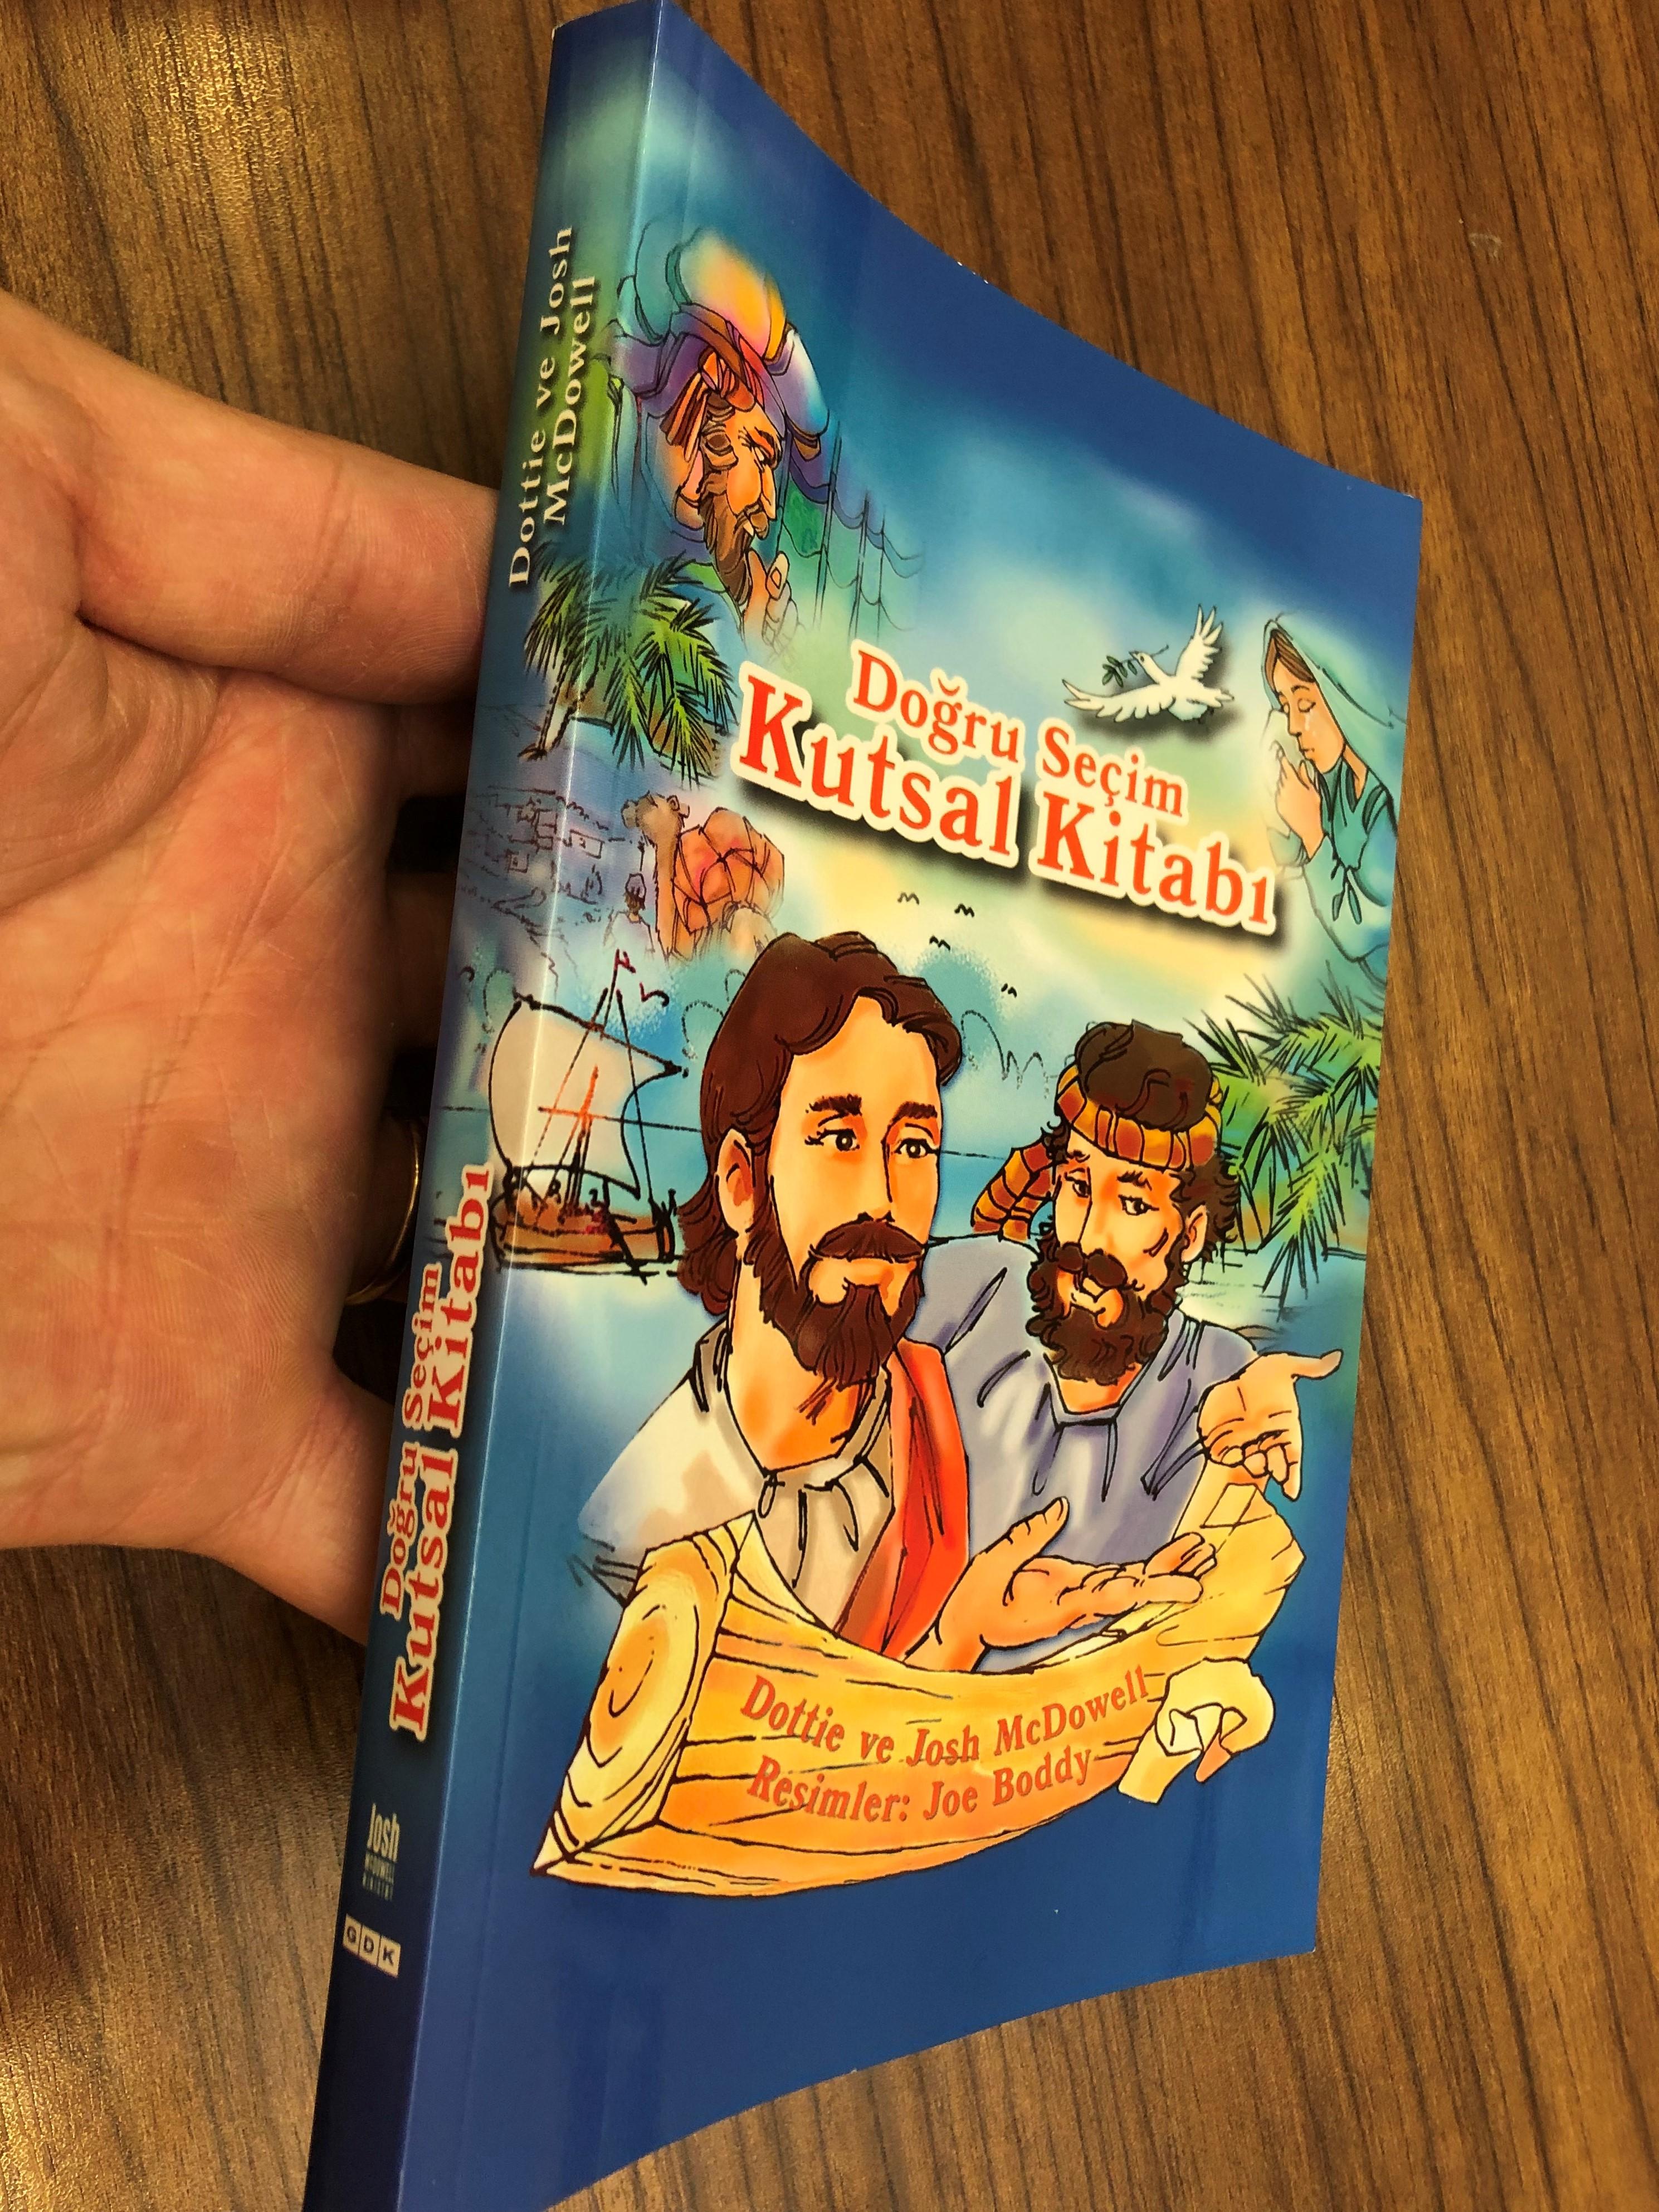 do-ru-se-im-kutsal-kitab-the-right-choices-bible-in-turkish-language-dottie-josh-mcdowell-gdk-paperback-2017-2-.jpg